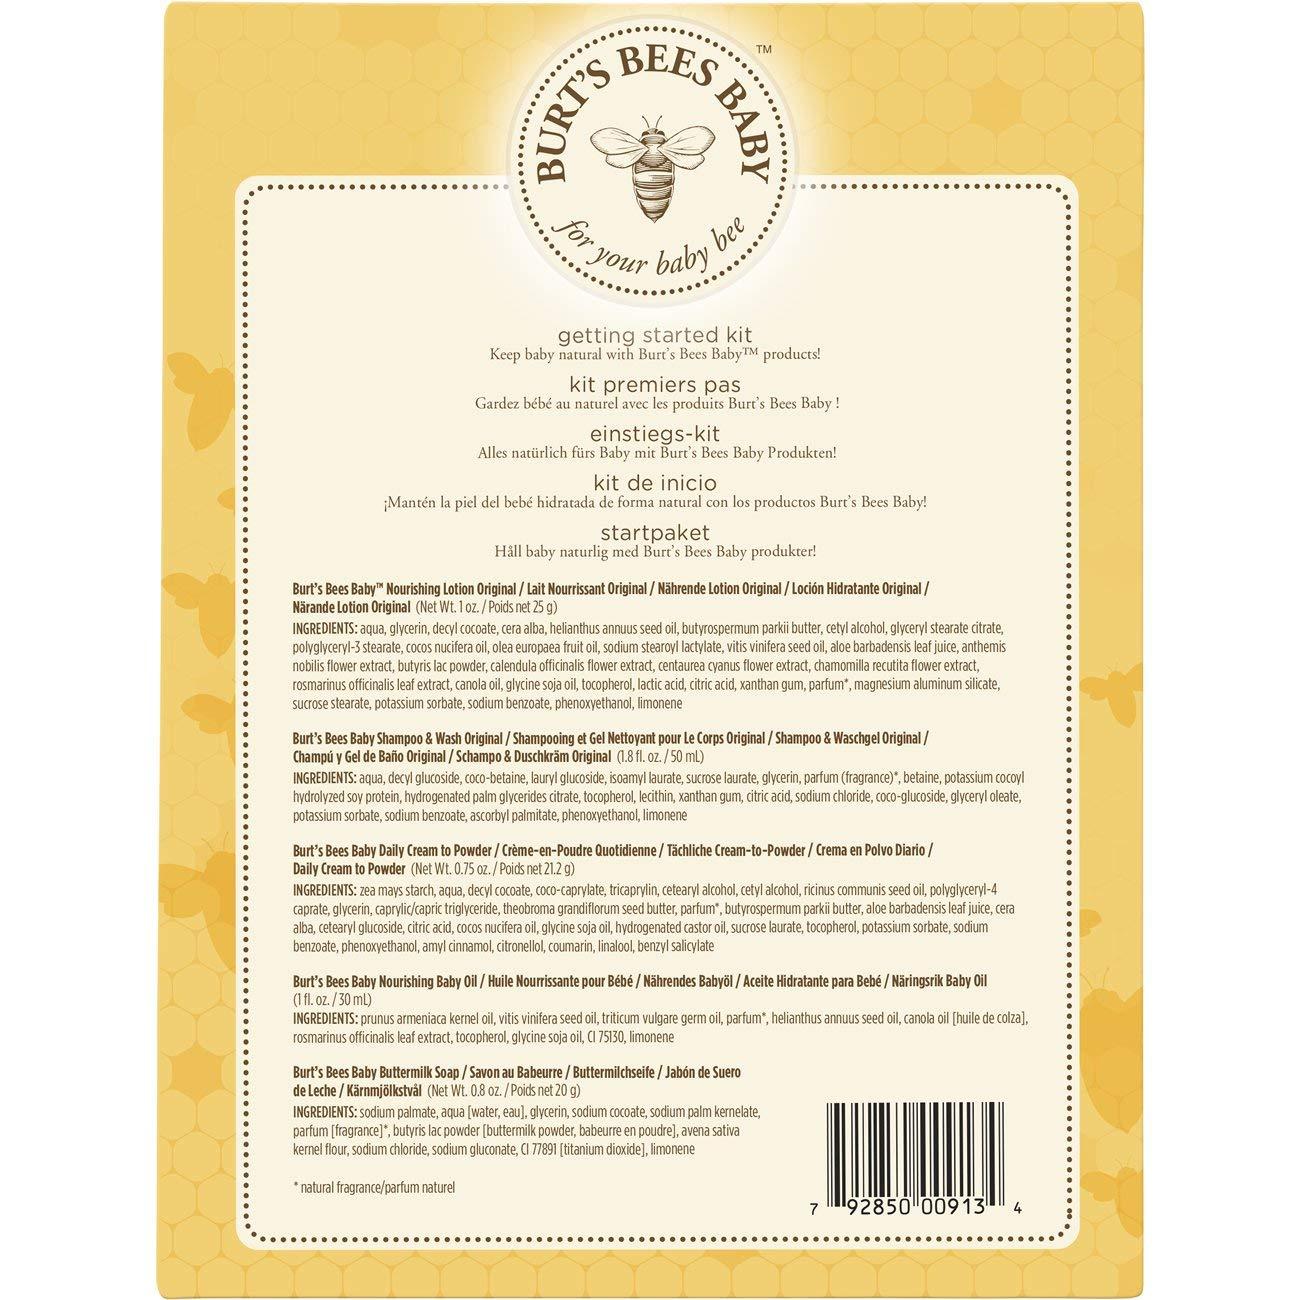 Amazon.com: Burts Bees Beauty Gift Set, 00913-24, Amarillo ...